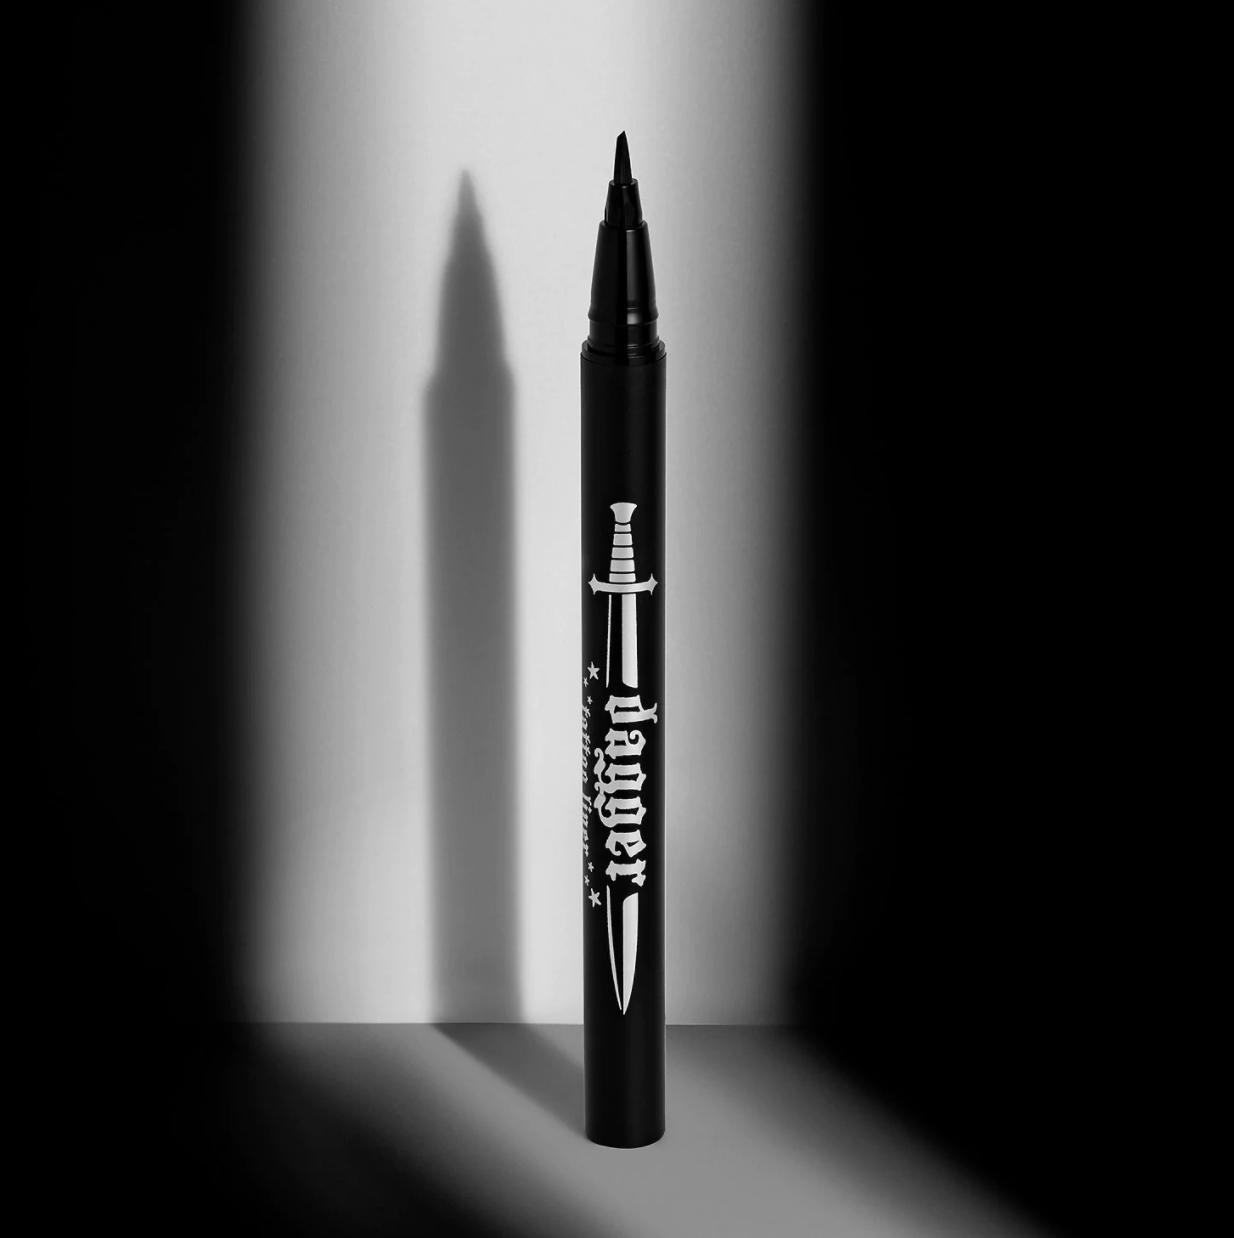 The eyeliner pen showing an angled felt tip